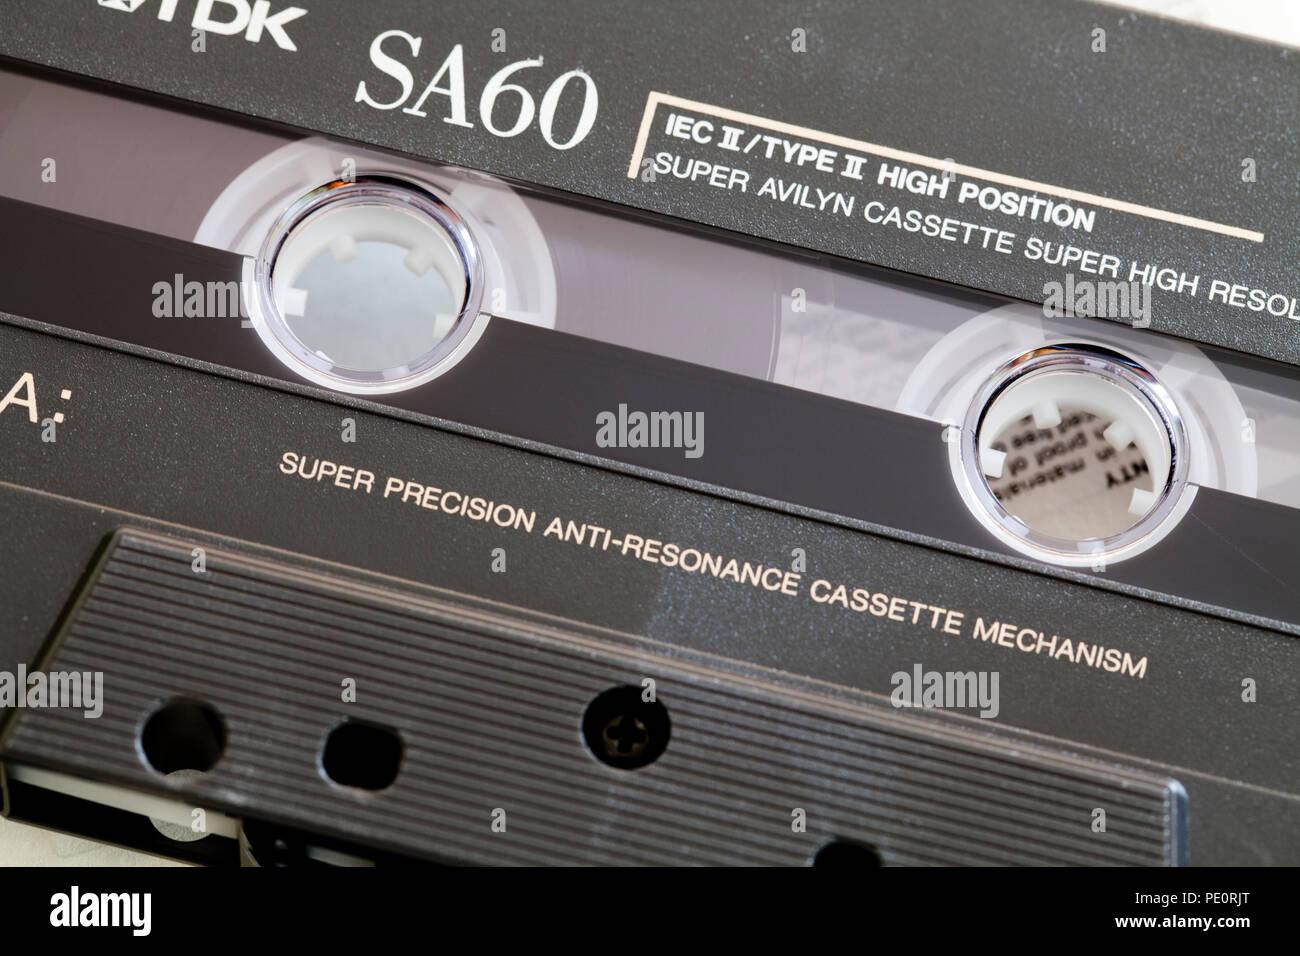 Compact audio cassette tape (aka compact cassette, music cassette) - USA Stock Photo